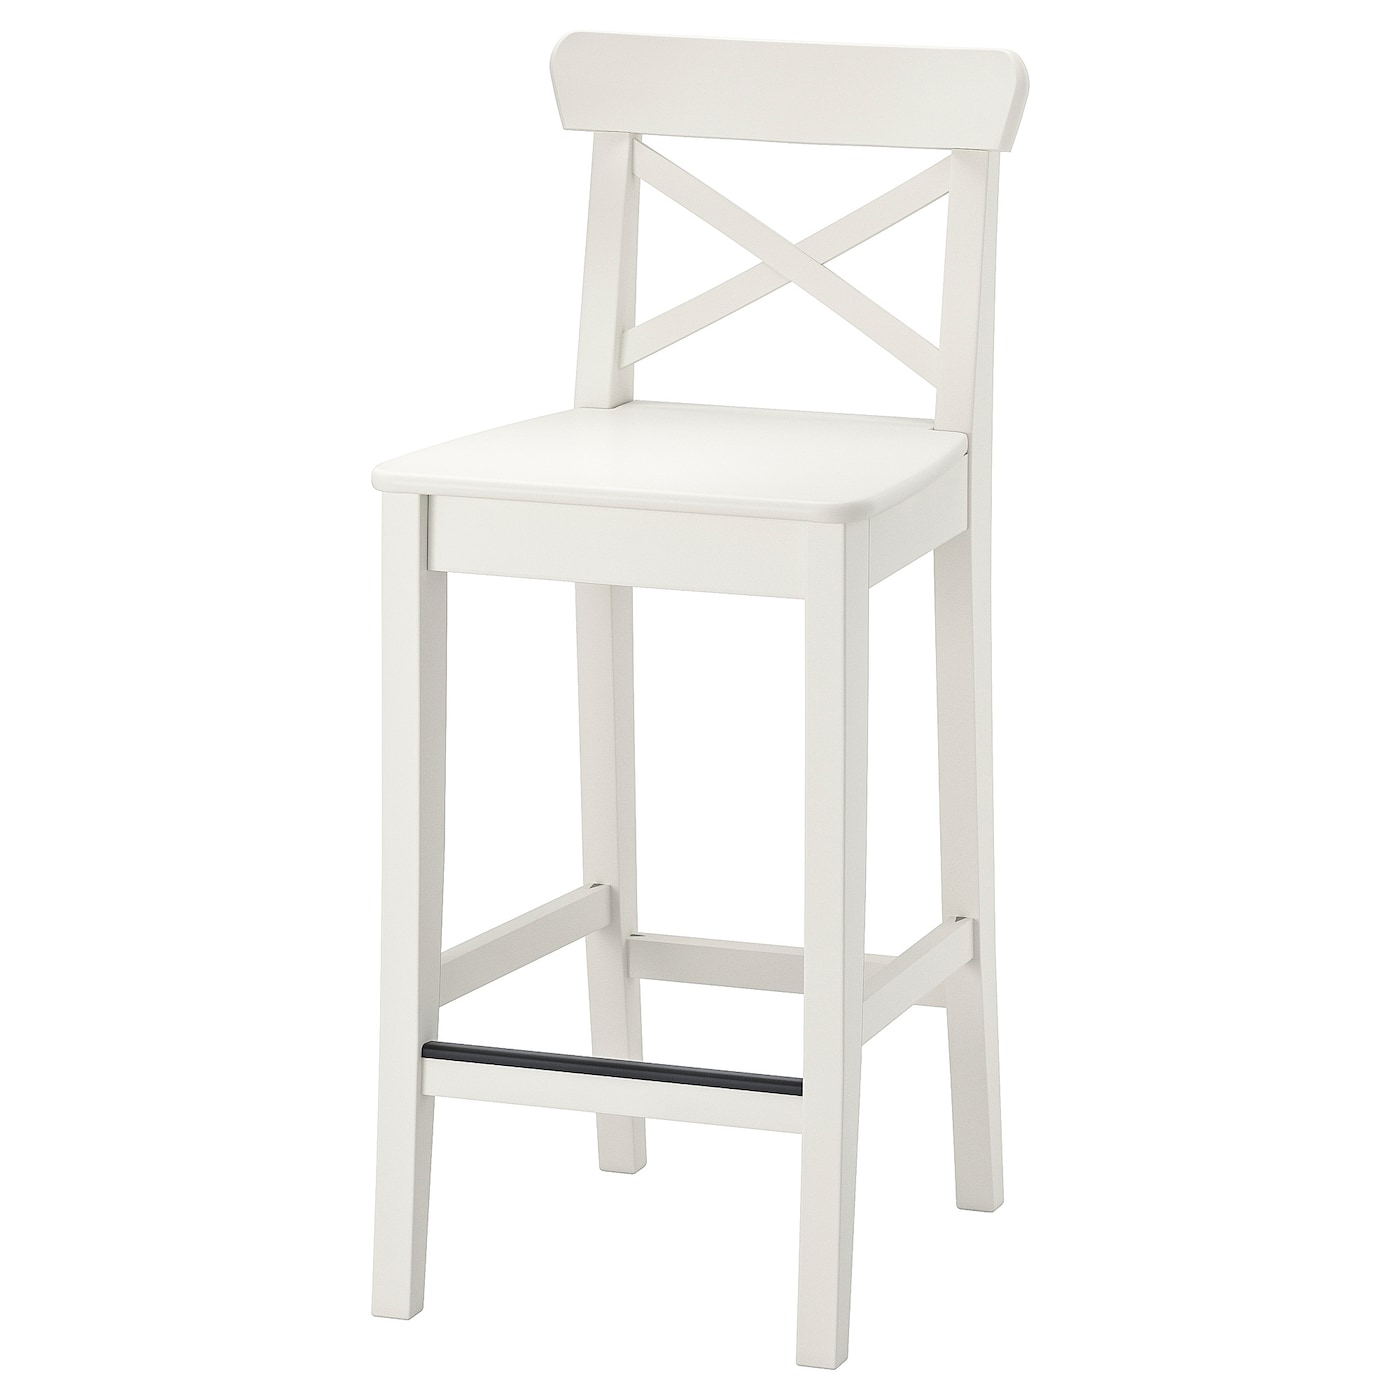 "Tabouret En Bois Ikea ingolf tabouret bar dossier - blanc 24 3/4 "" (63 cm)"